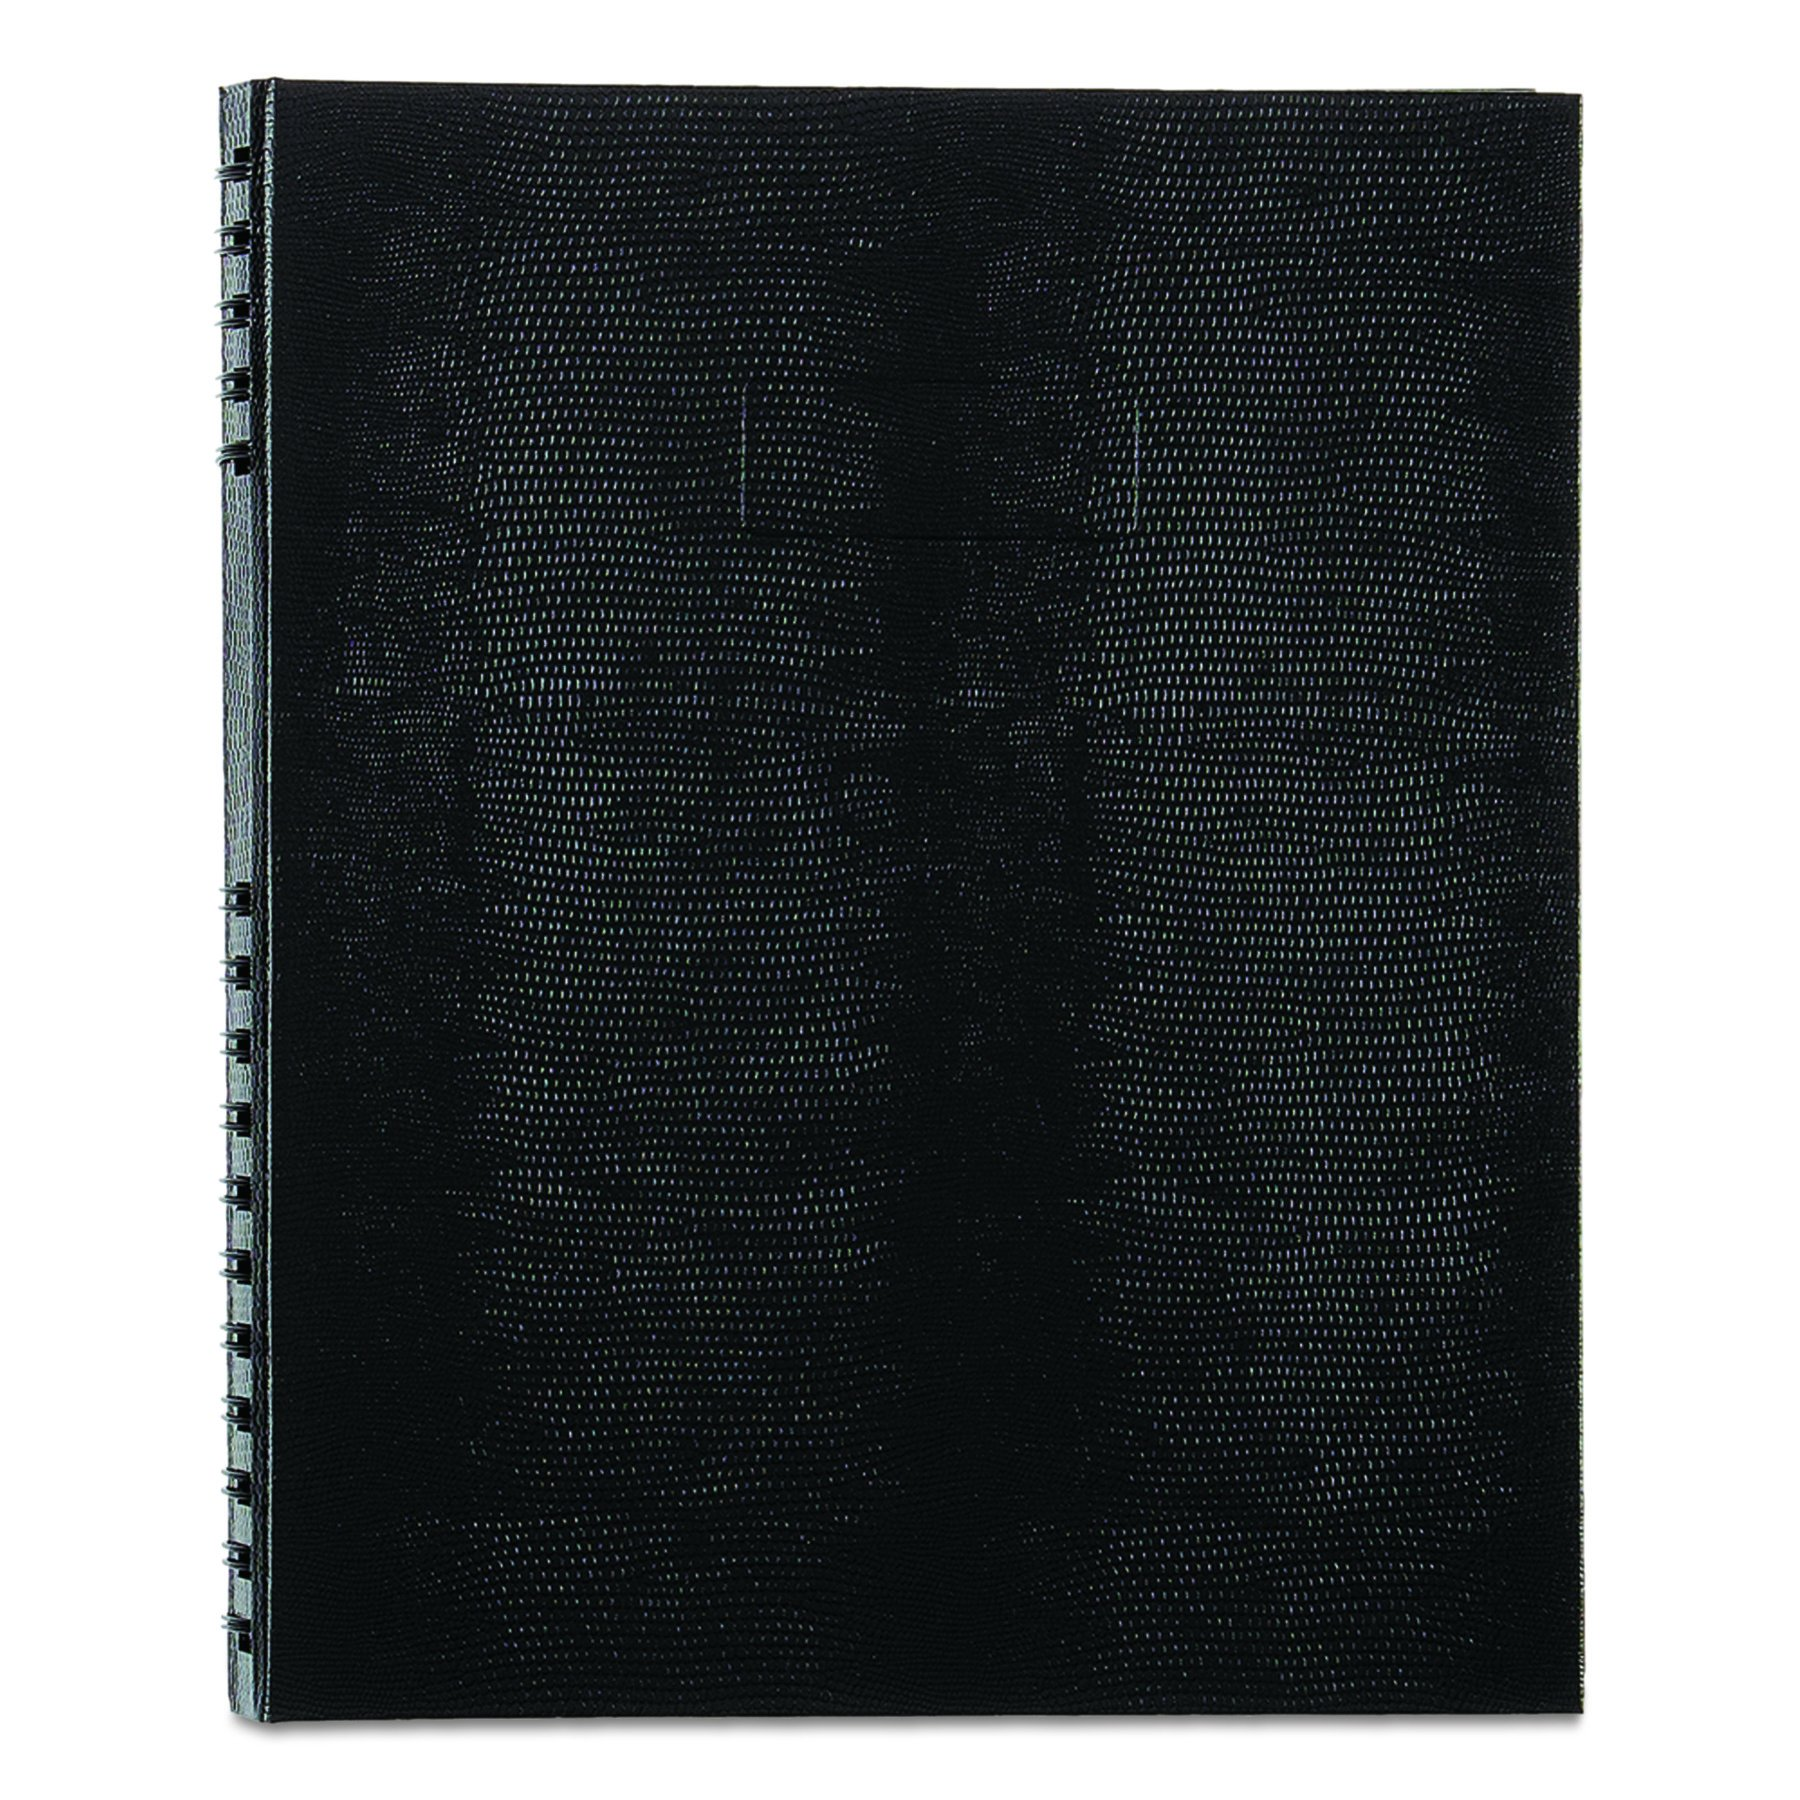 BLUELINE NotePro Notebook, Black, 11 x 8.5'' 200 Pages (A10200.BLK)